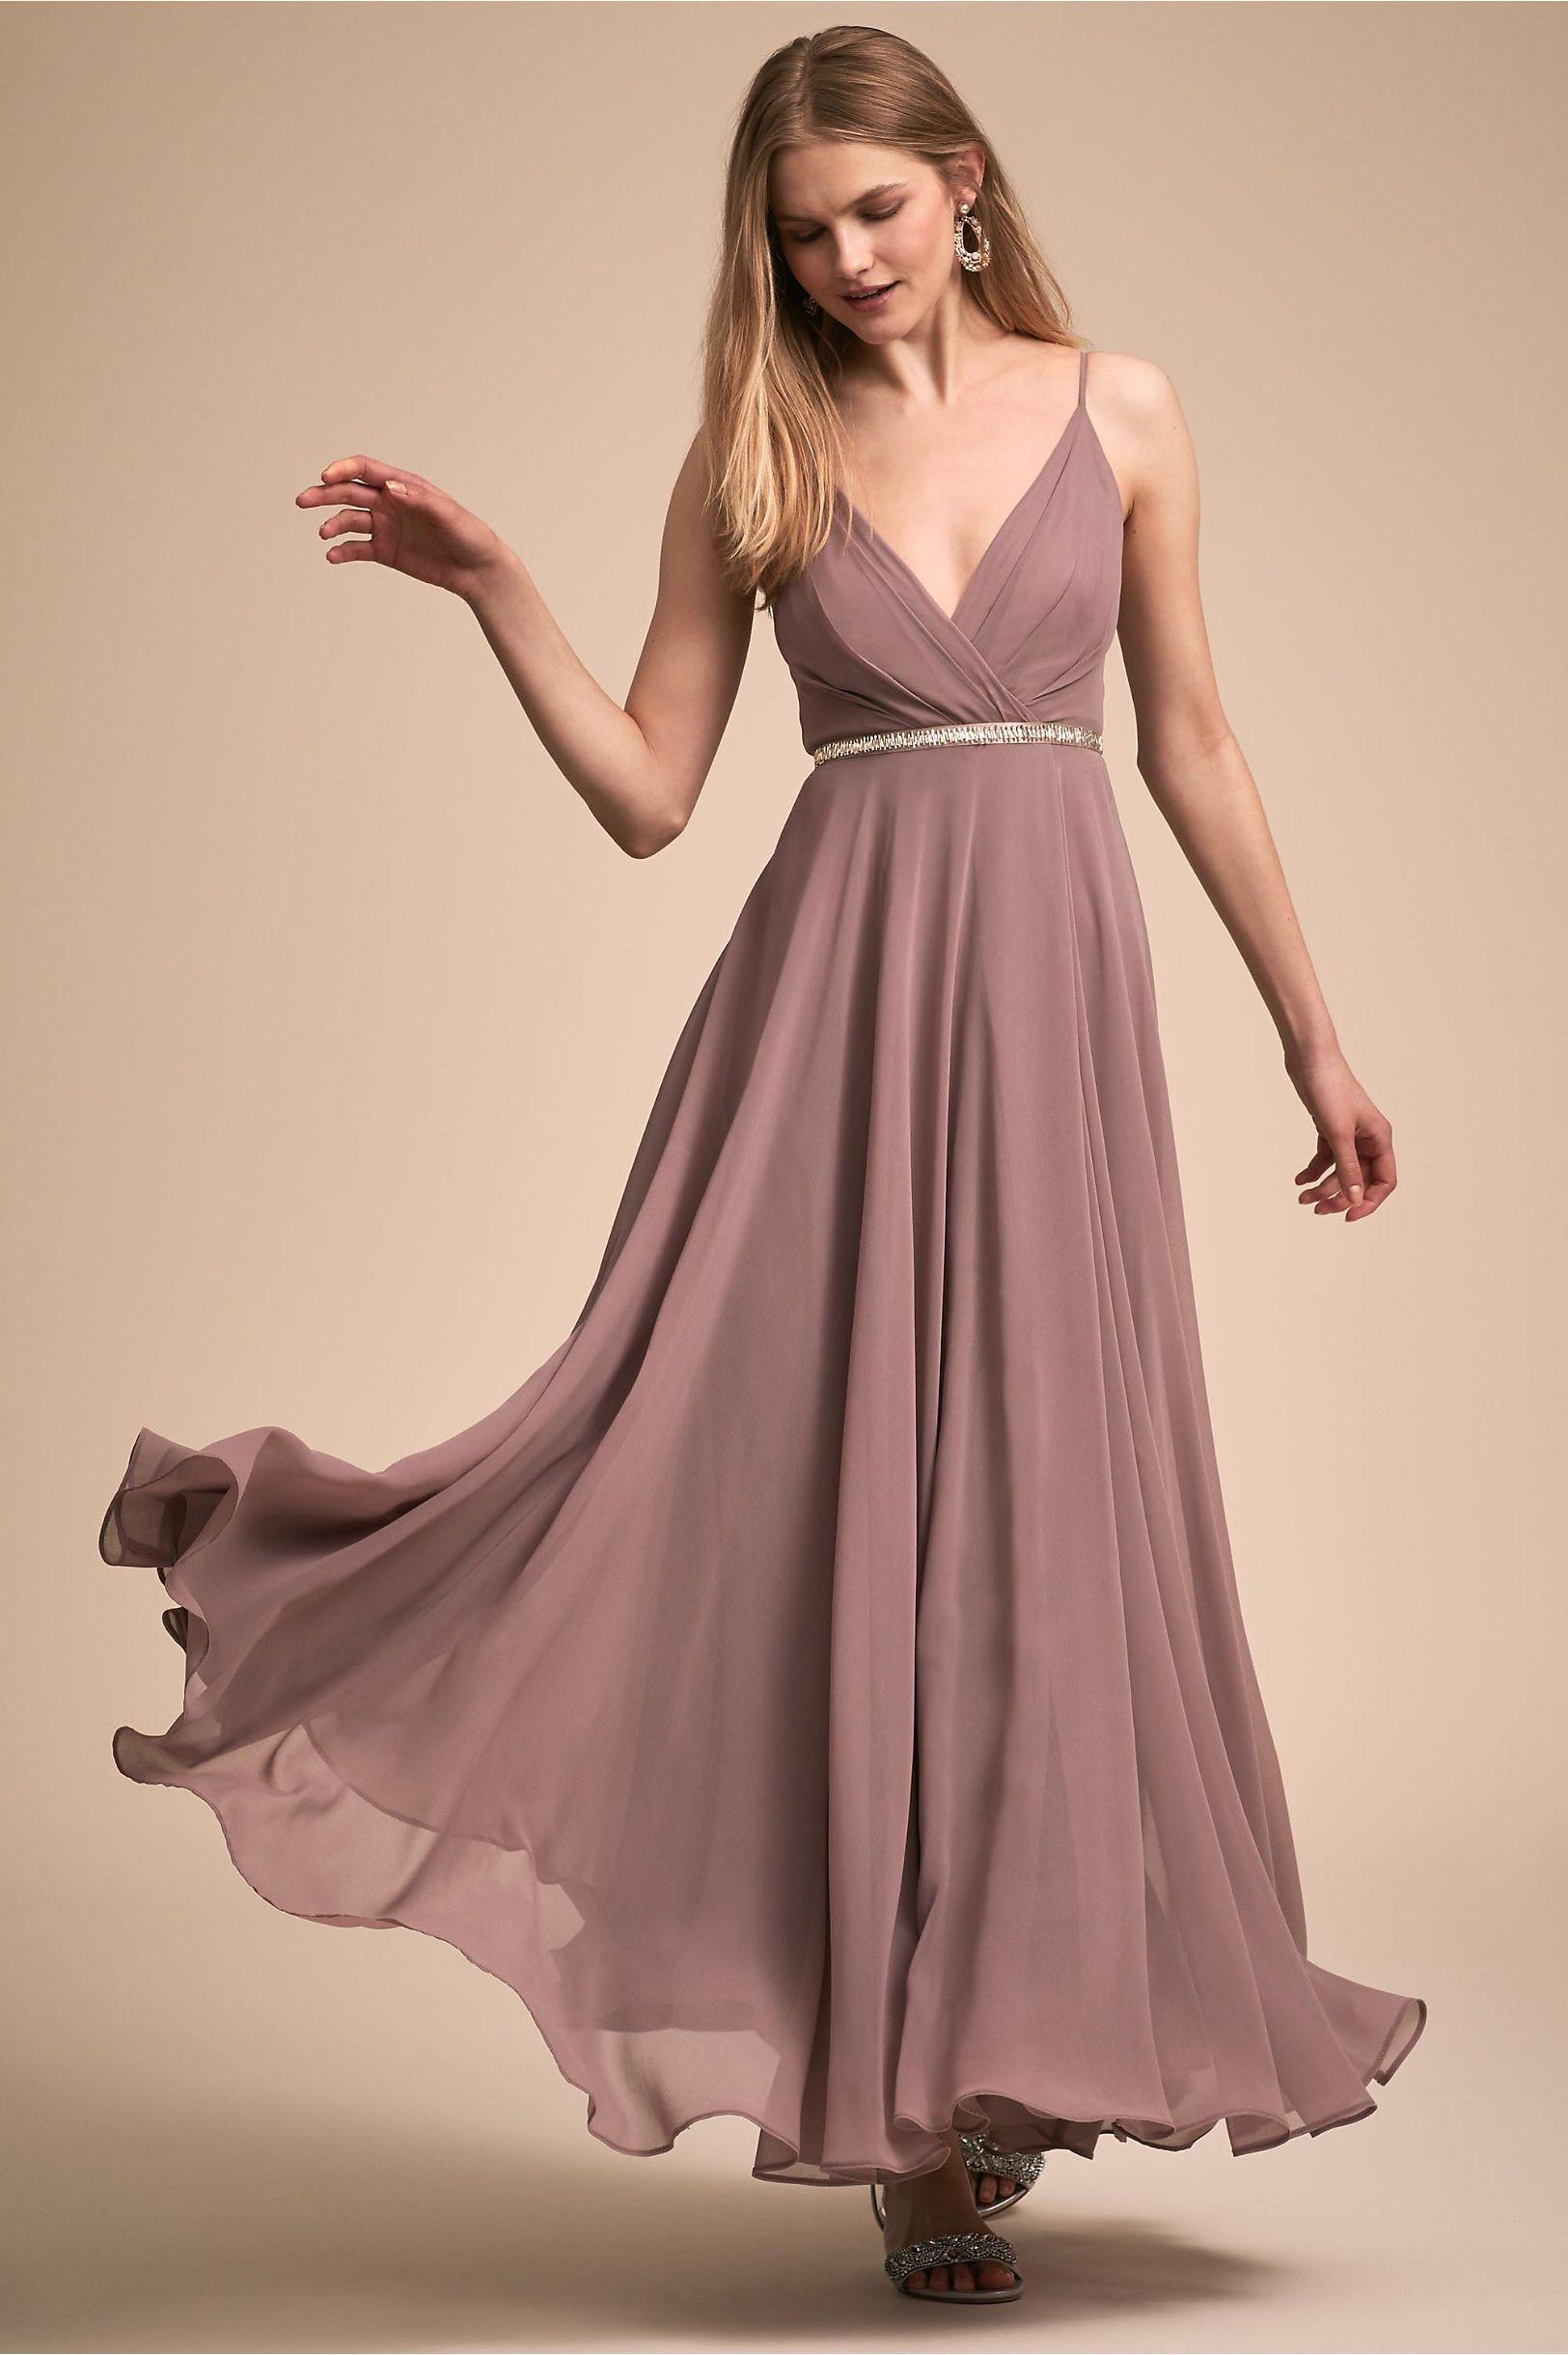 Gray dress for wedding party  BHLDNus Eva Dress in Violet Grey  Products  Pinterest  Bridal